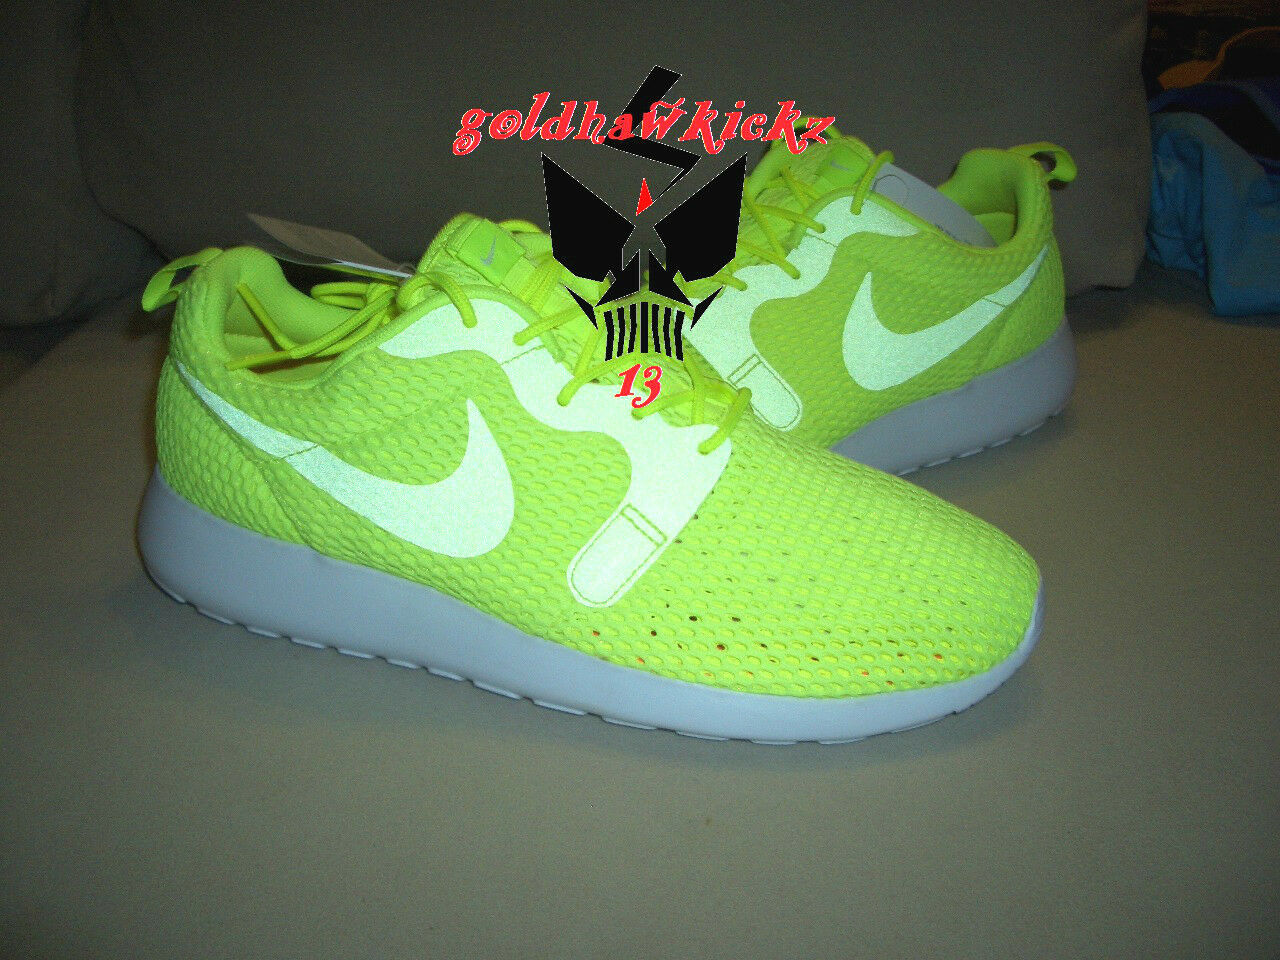 Nike Roshe One Hyp BR Breathe Hyperfuse 833125 700 volt 3M men running shoes